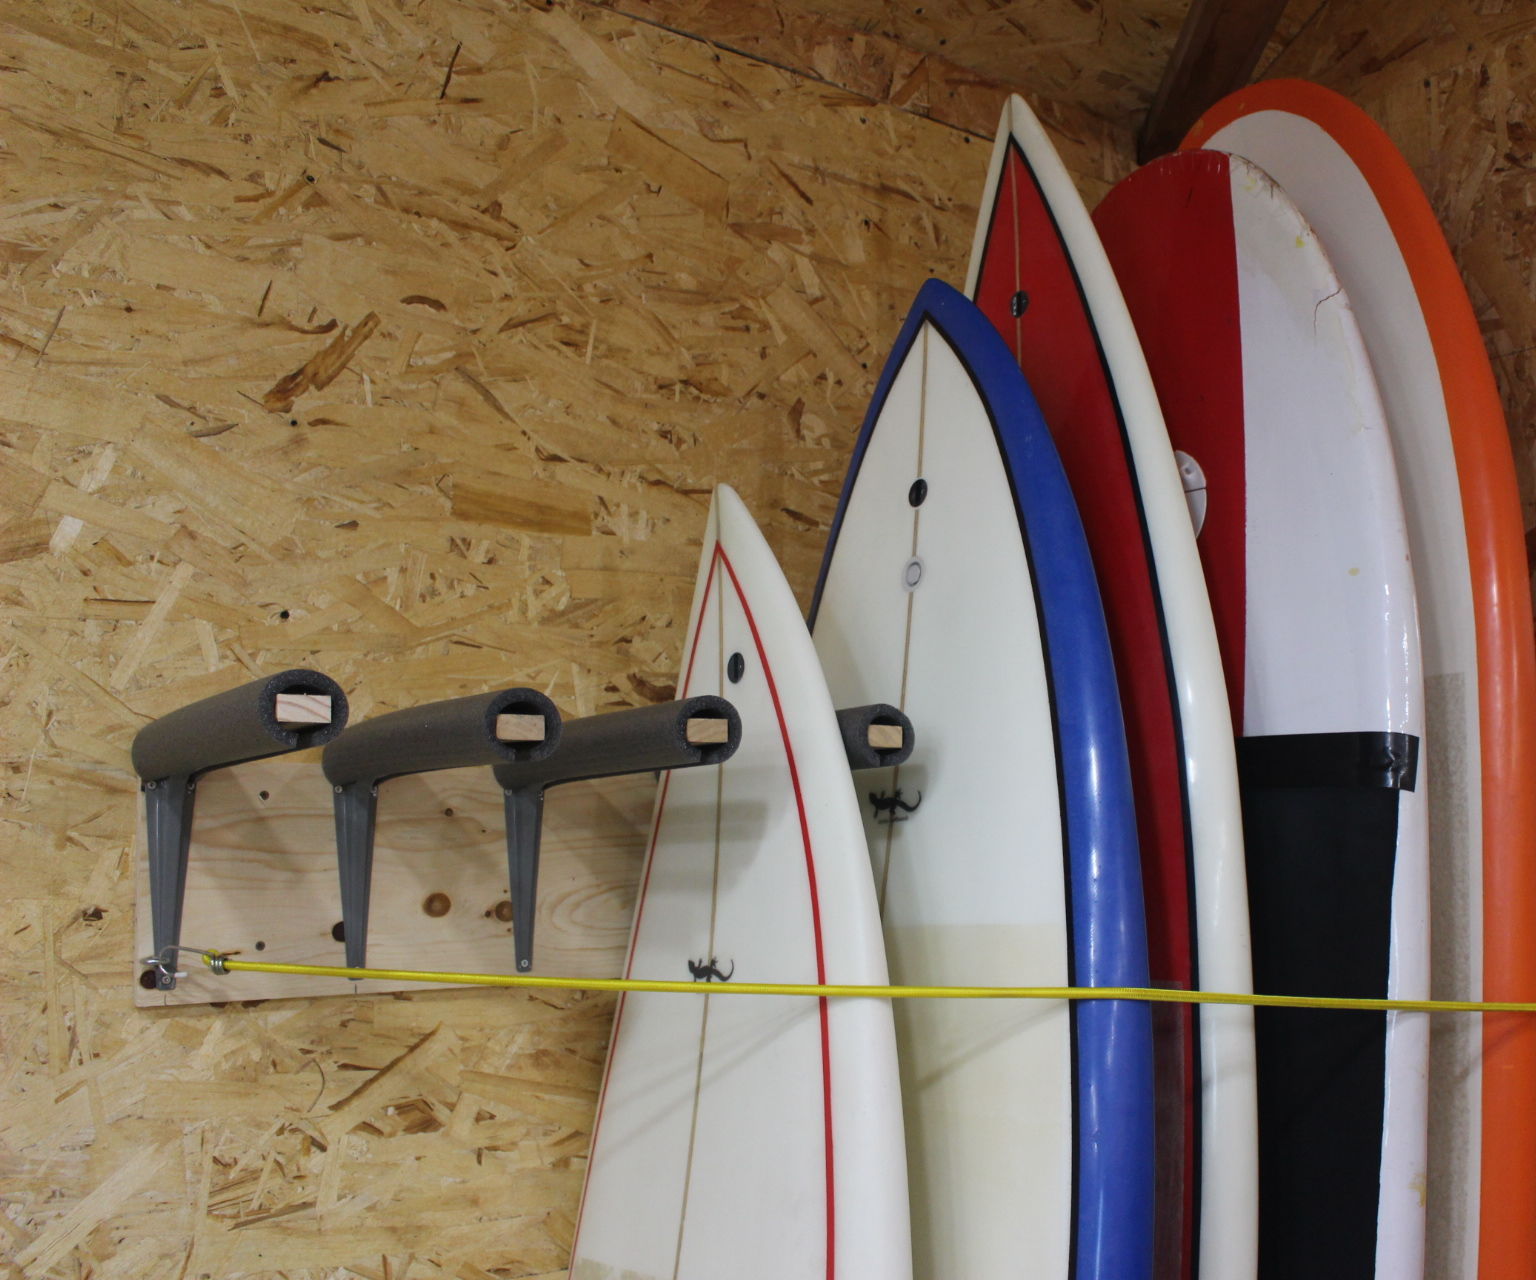 diy surfboard rack 5 steps with